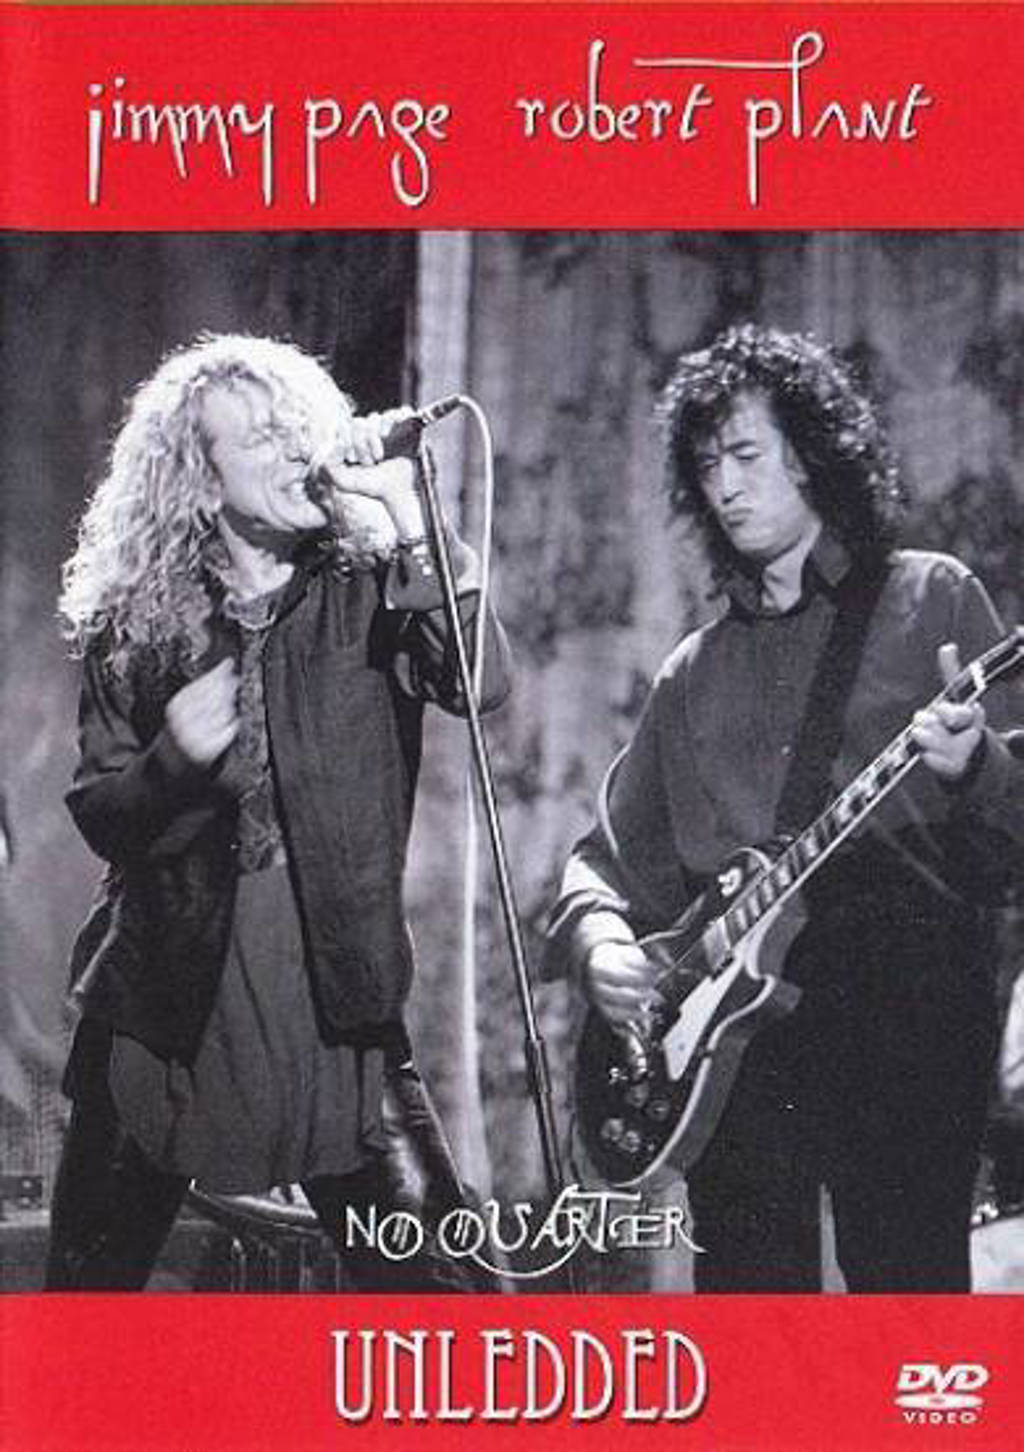 Jimmy Page & Robert Plant - No quarter unledded (DVD)